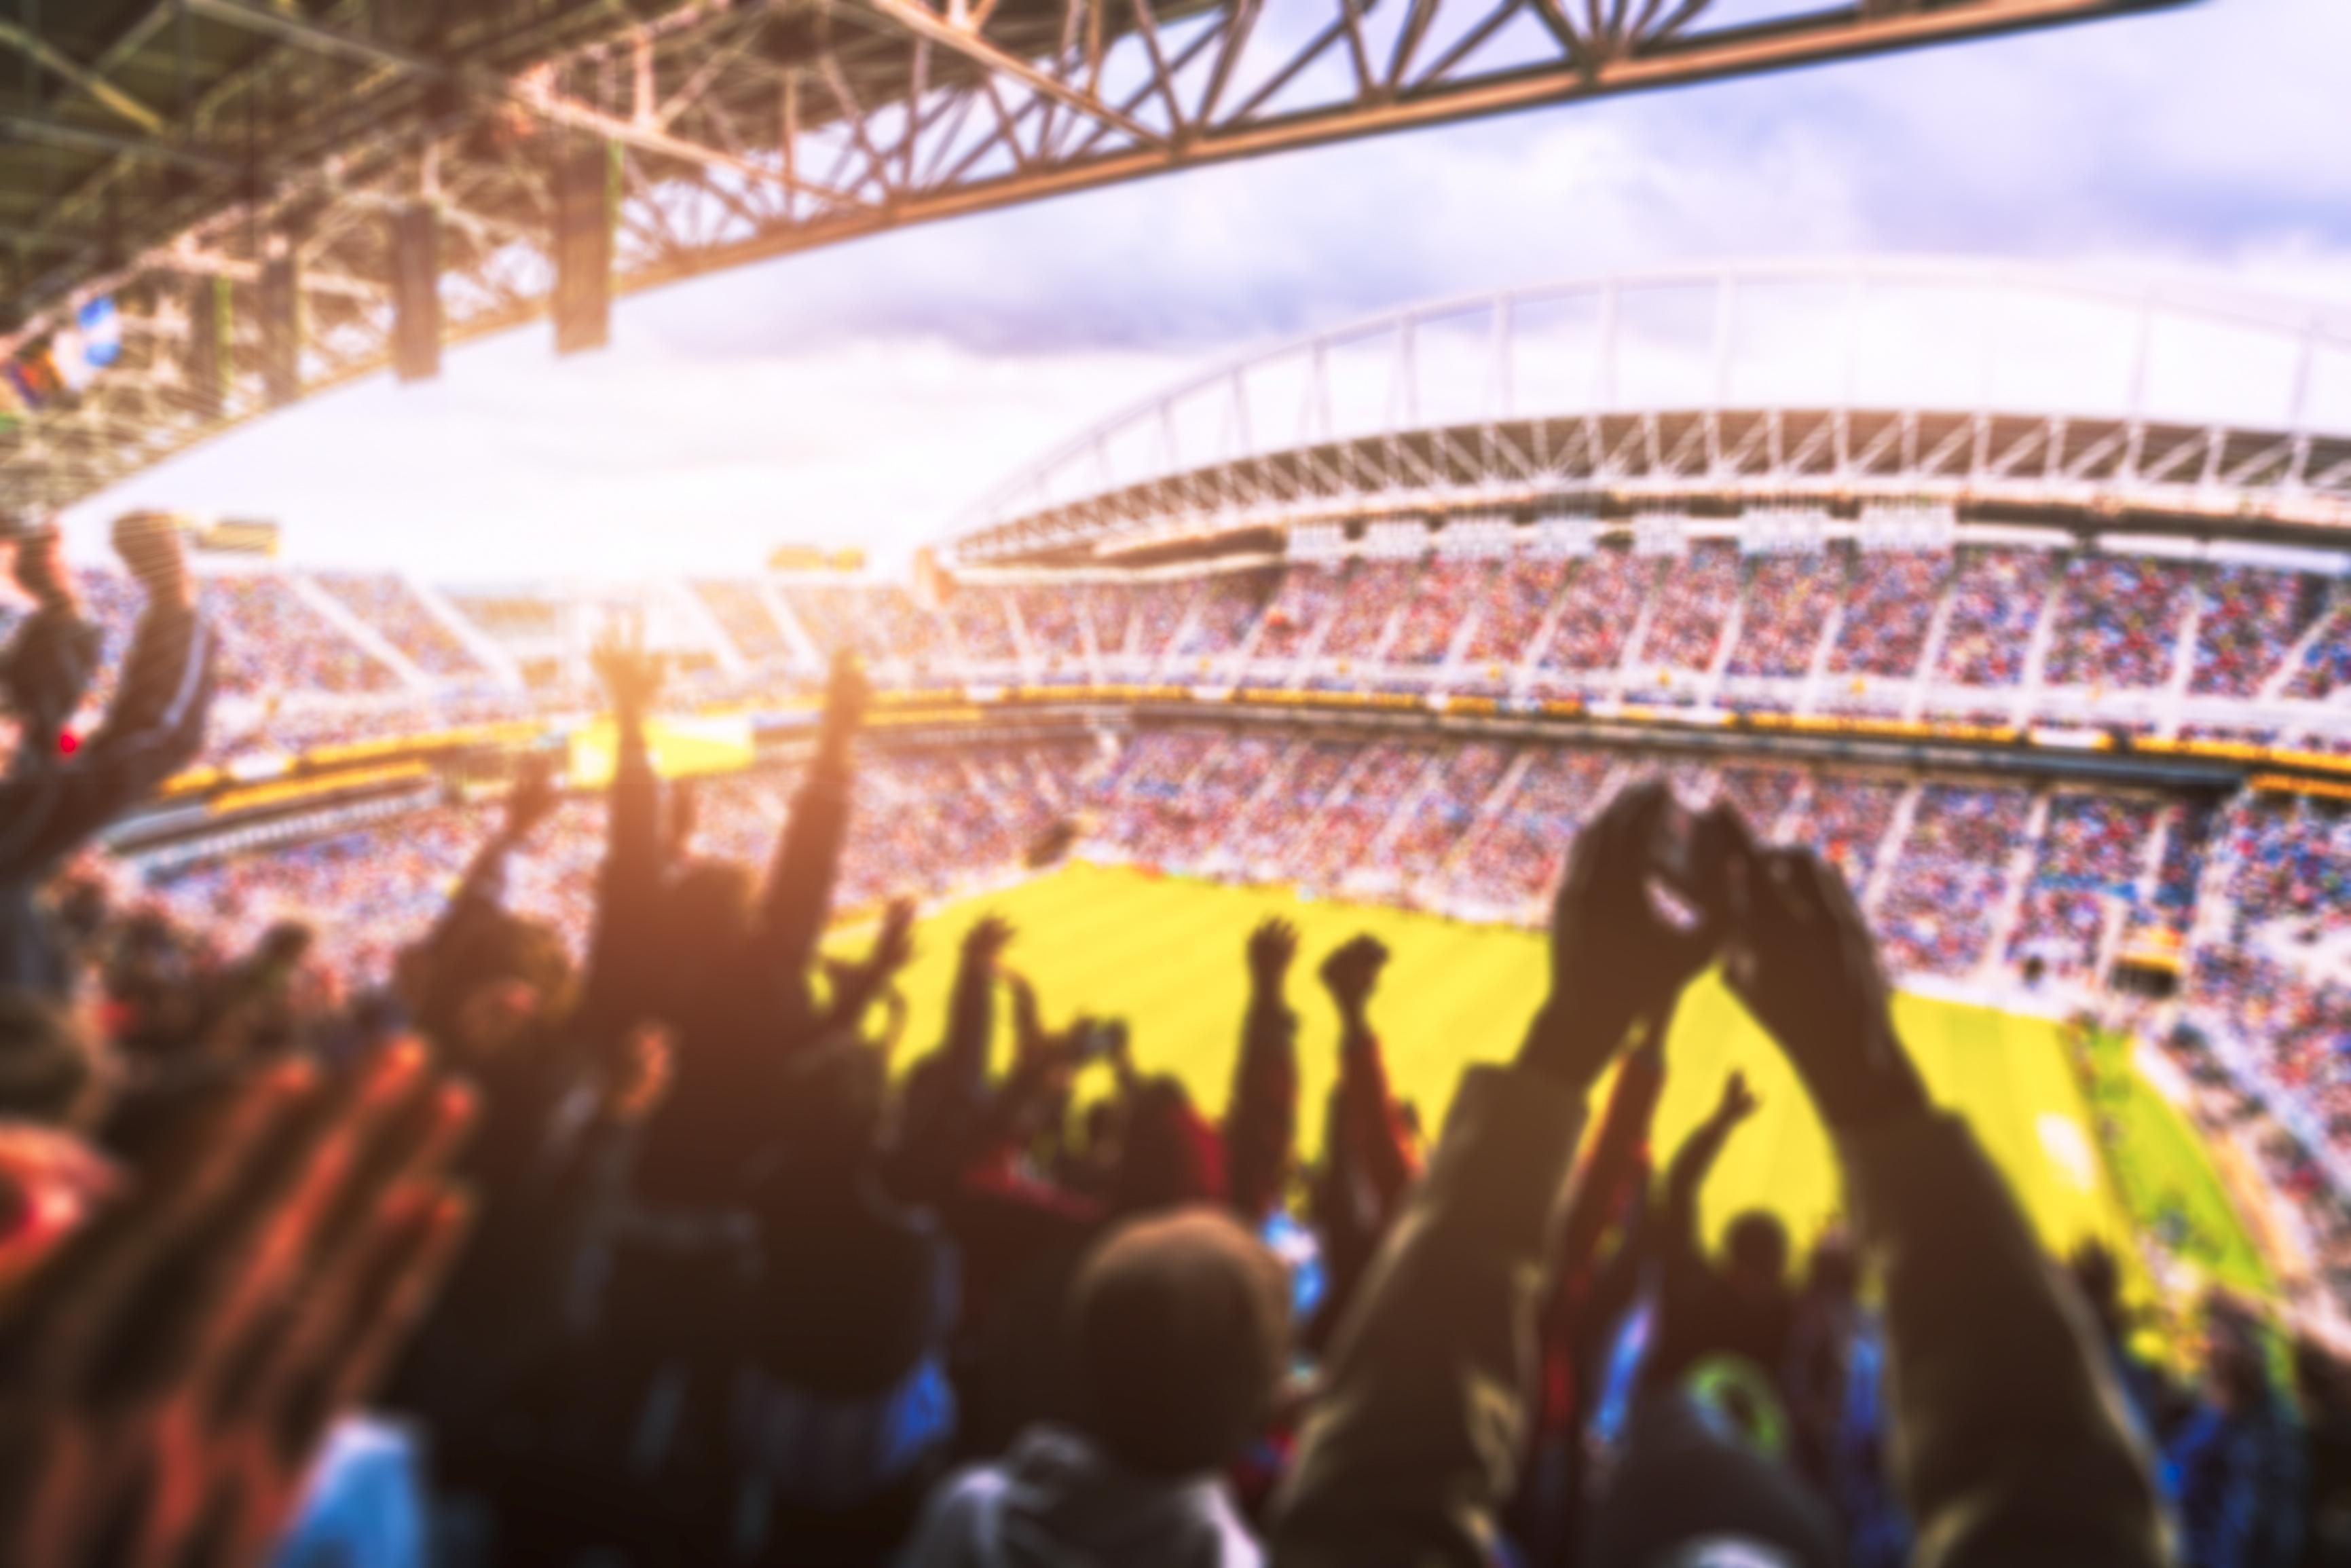 Football- Soccer,a lot of fans  in full stadium celebrate goal. blurred.